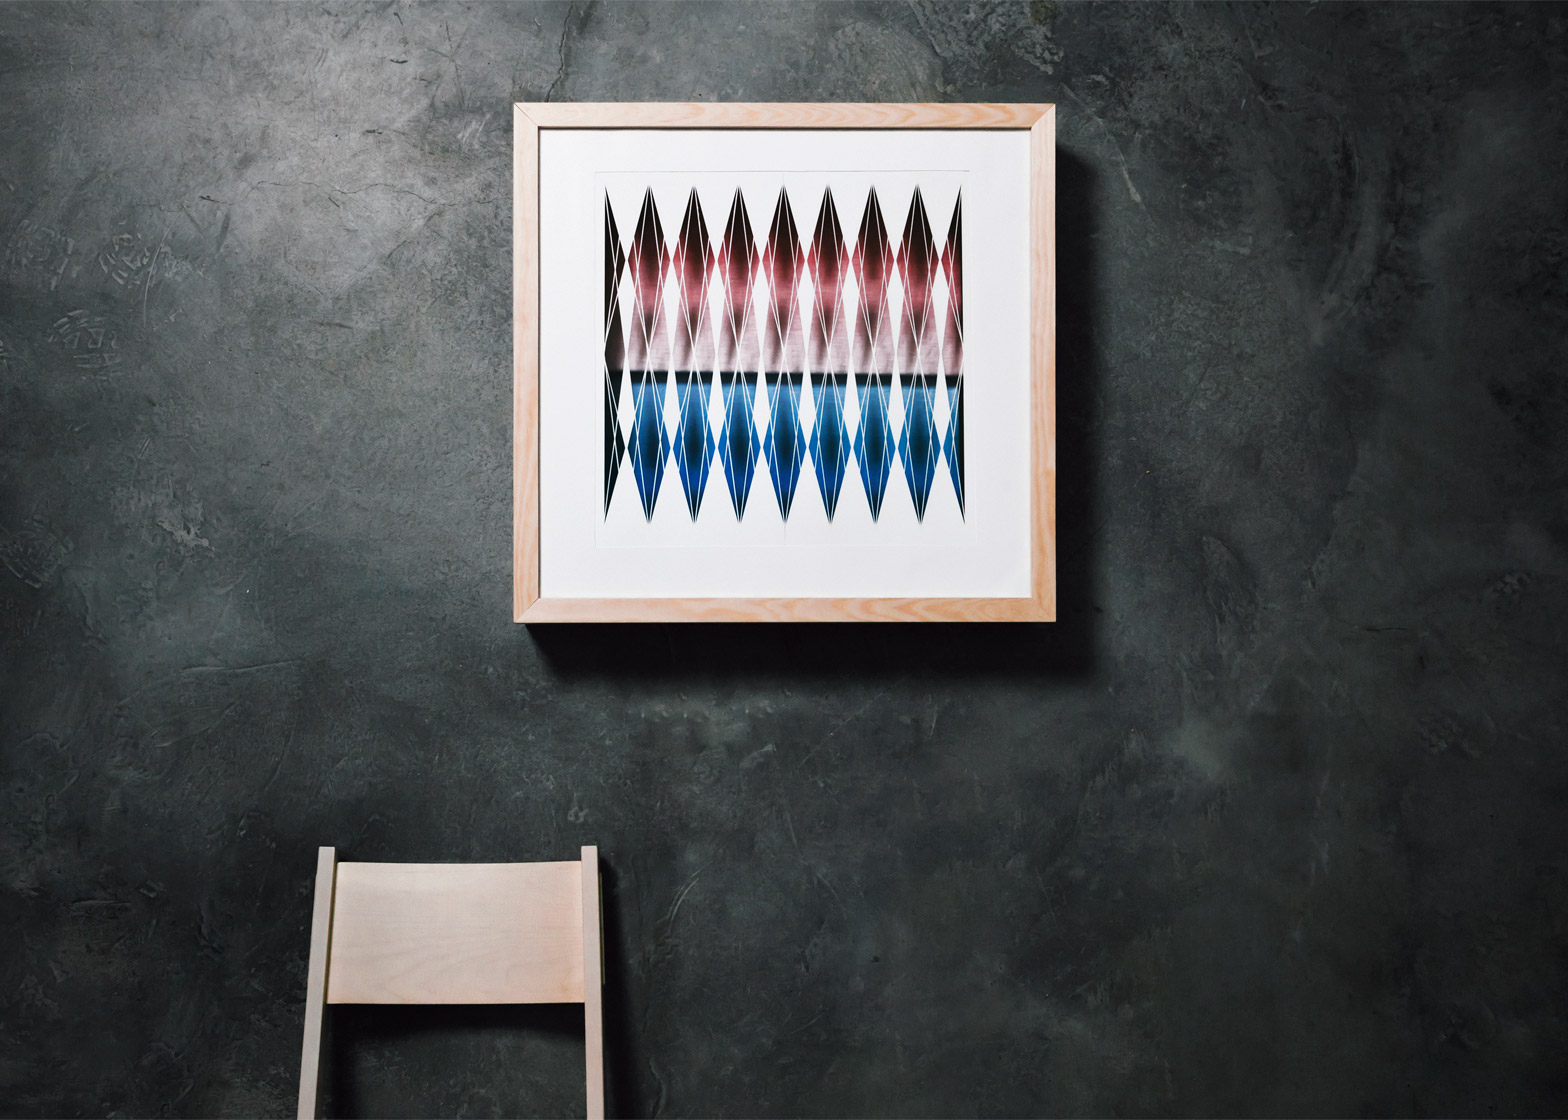 Ikea-Space-10-Innovation-Lab_products_Alastair-Philip-Wiper_dezeen_1568_2